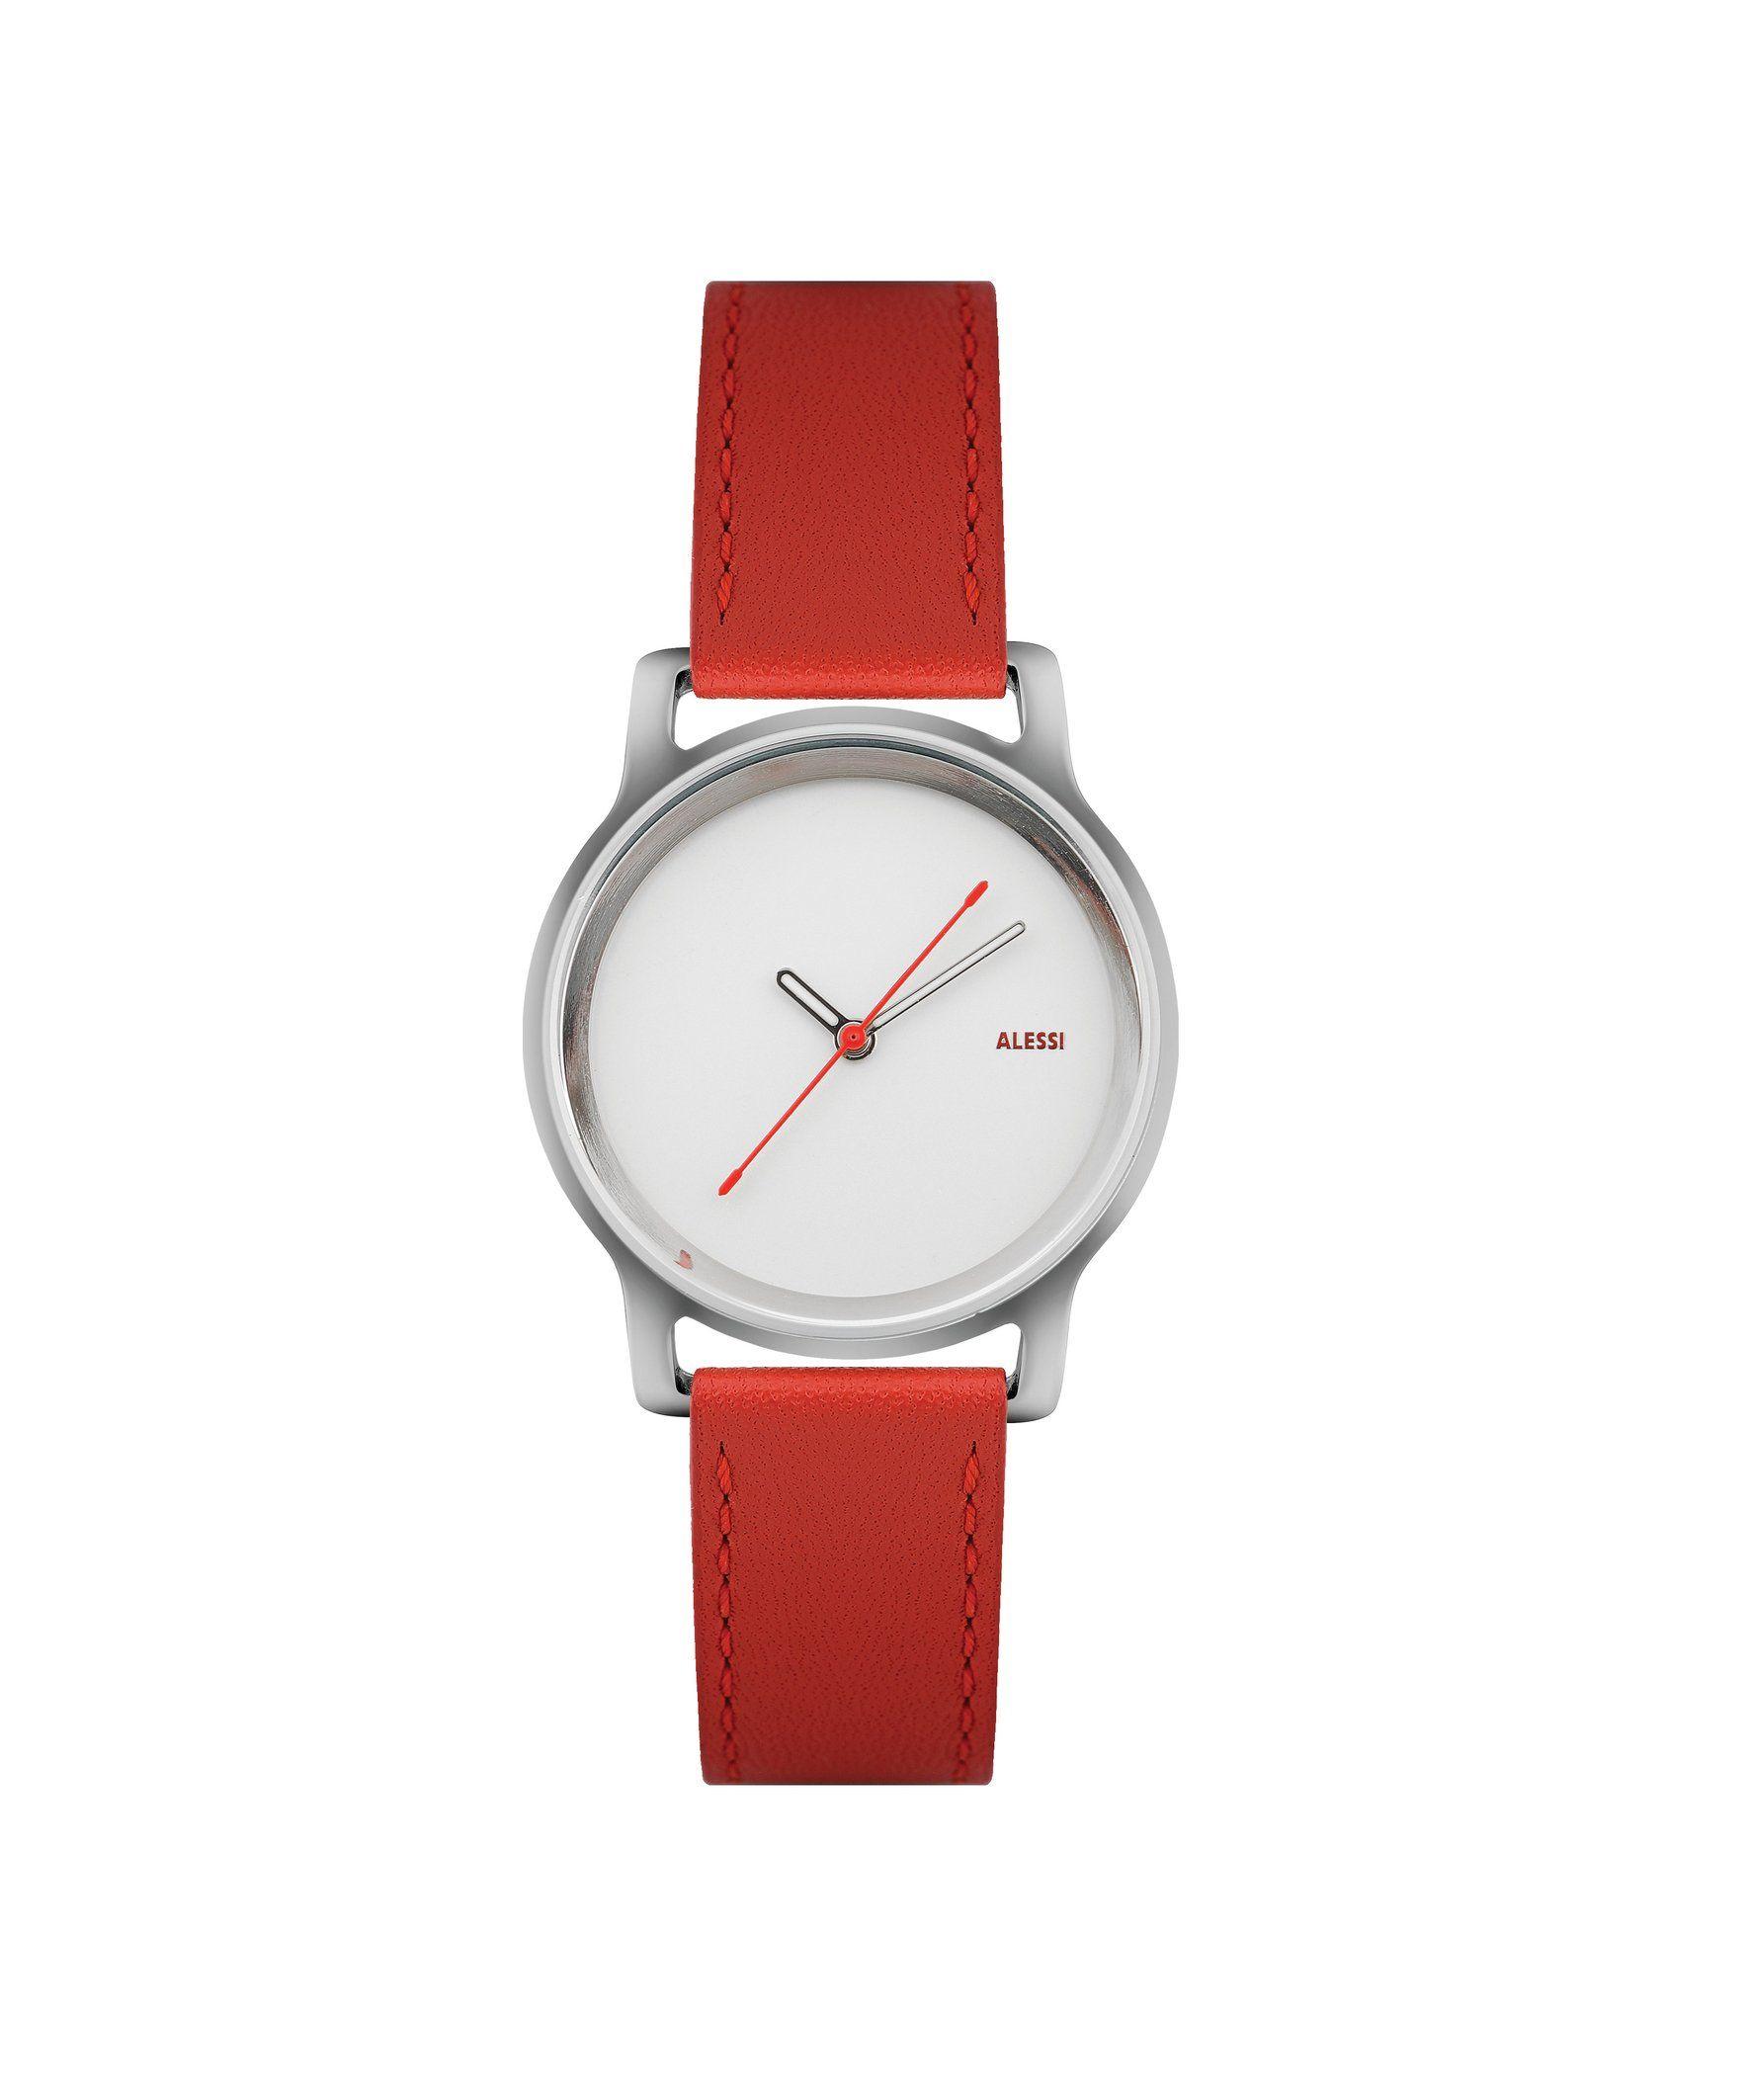 Alessi al28021 i 39 orologio wrist watch by for Amazon alessi